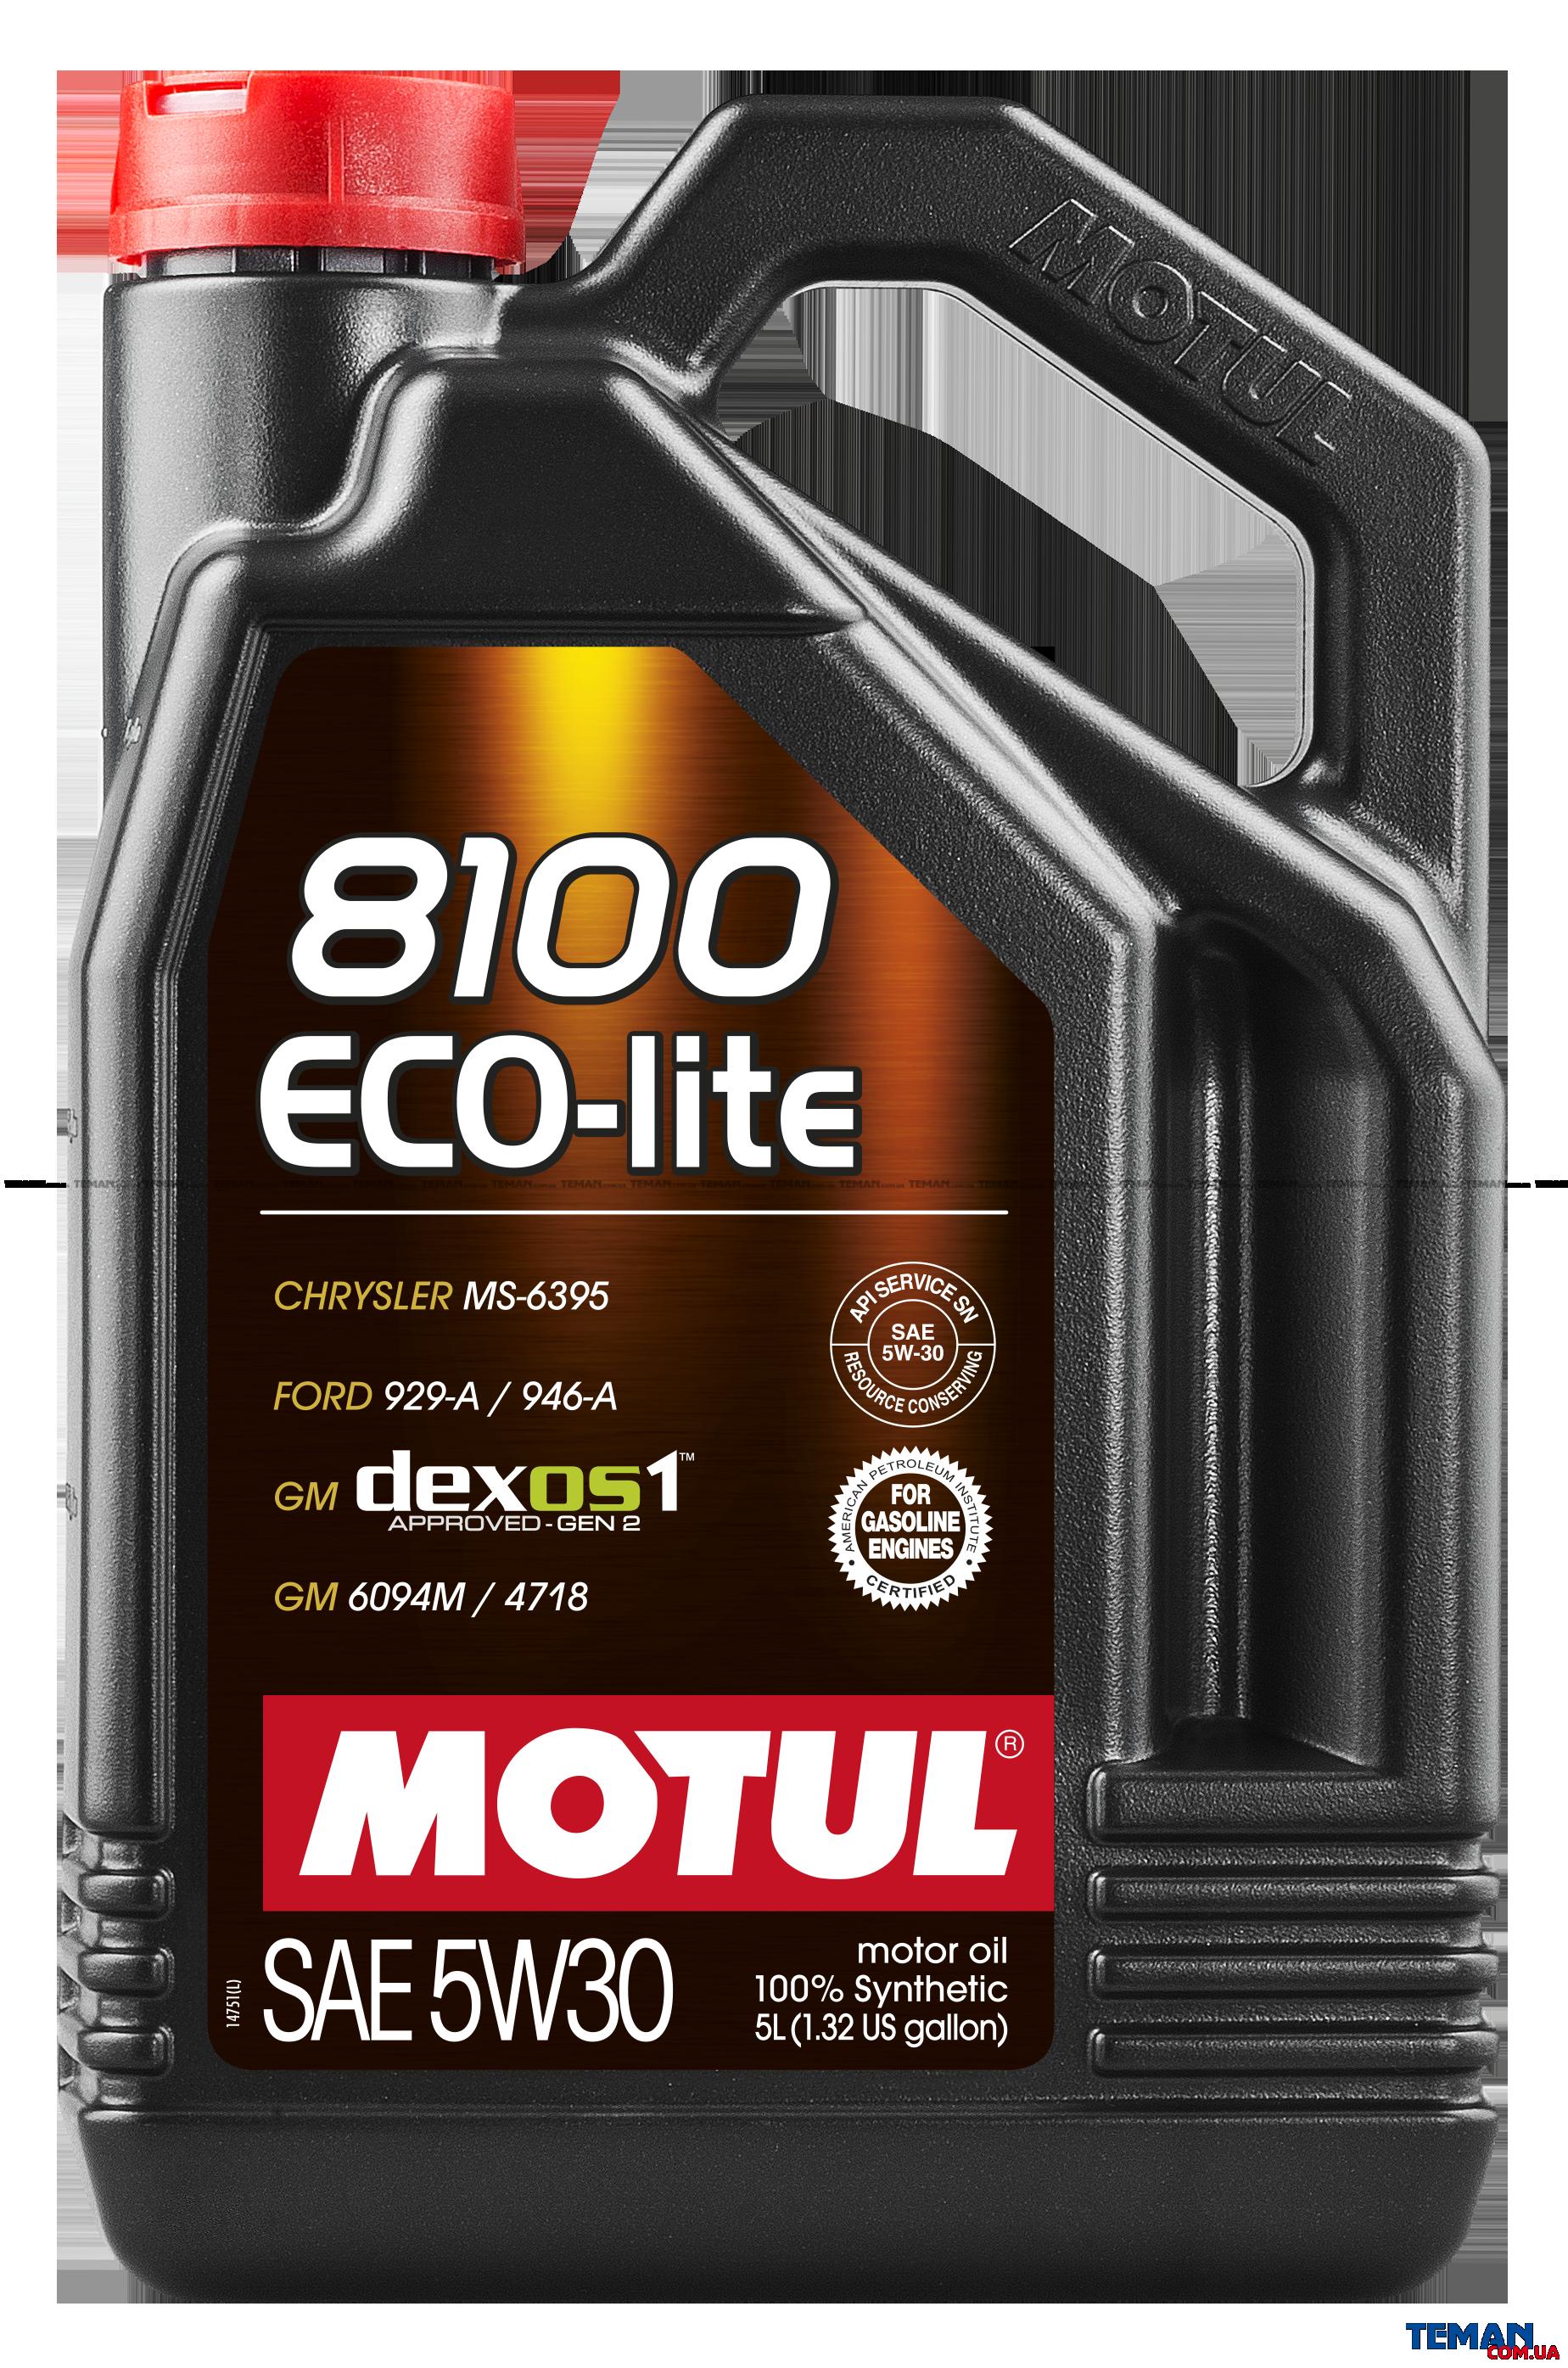 Синтетическое моторное масло 8100 Eco-lite SAE 5W30, 5 л